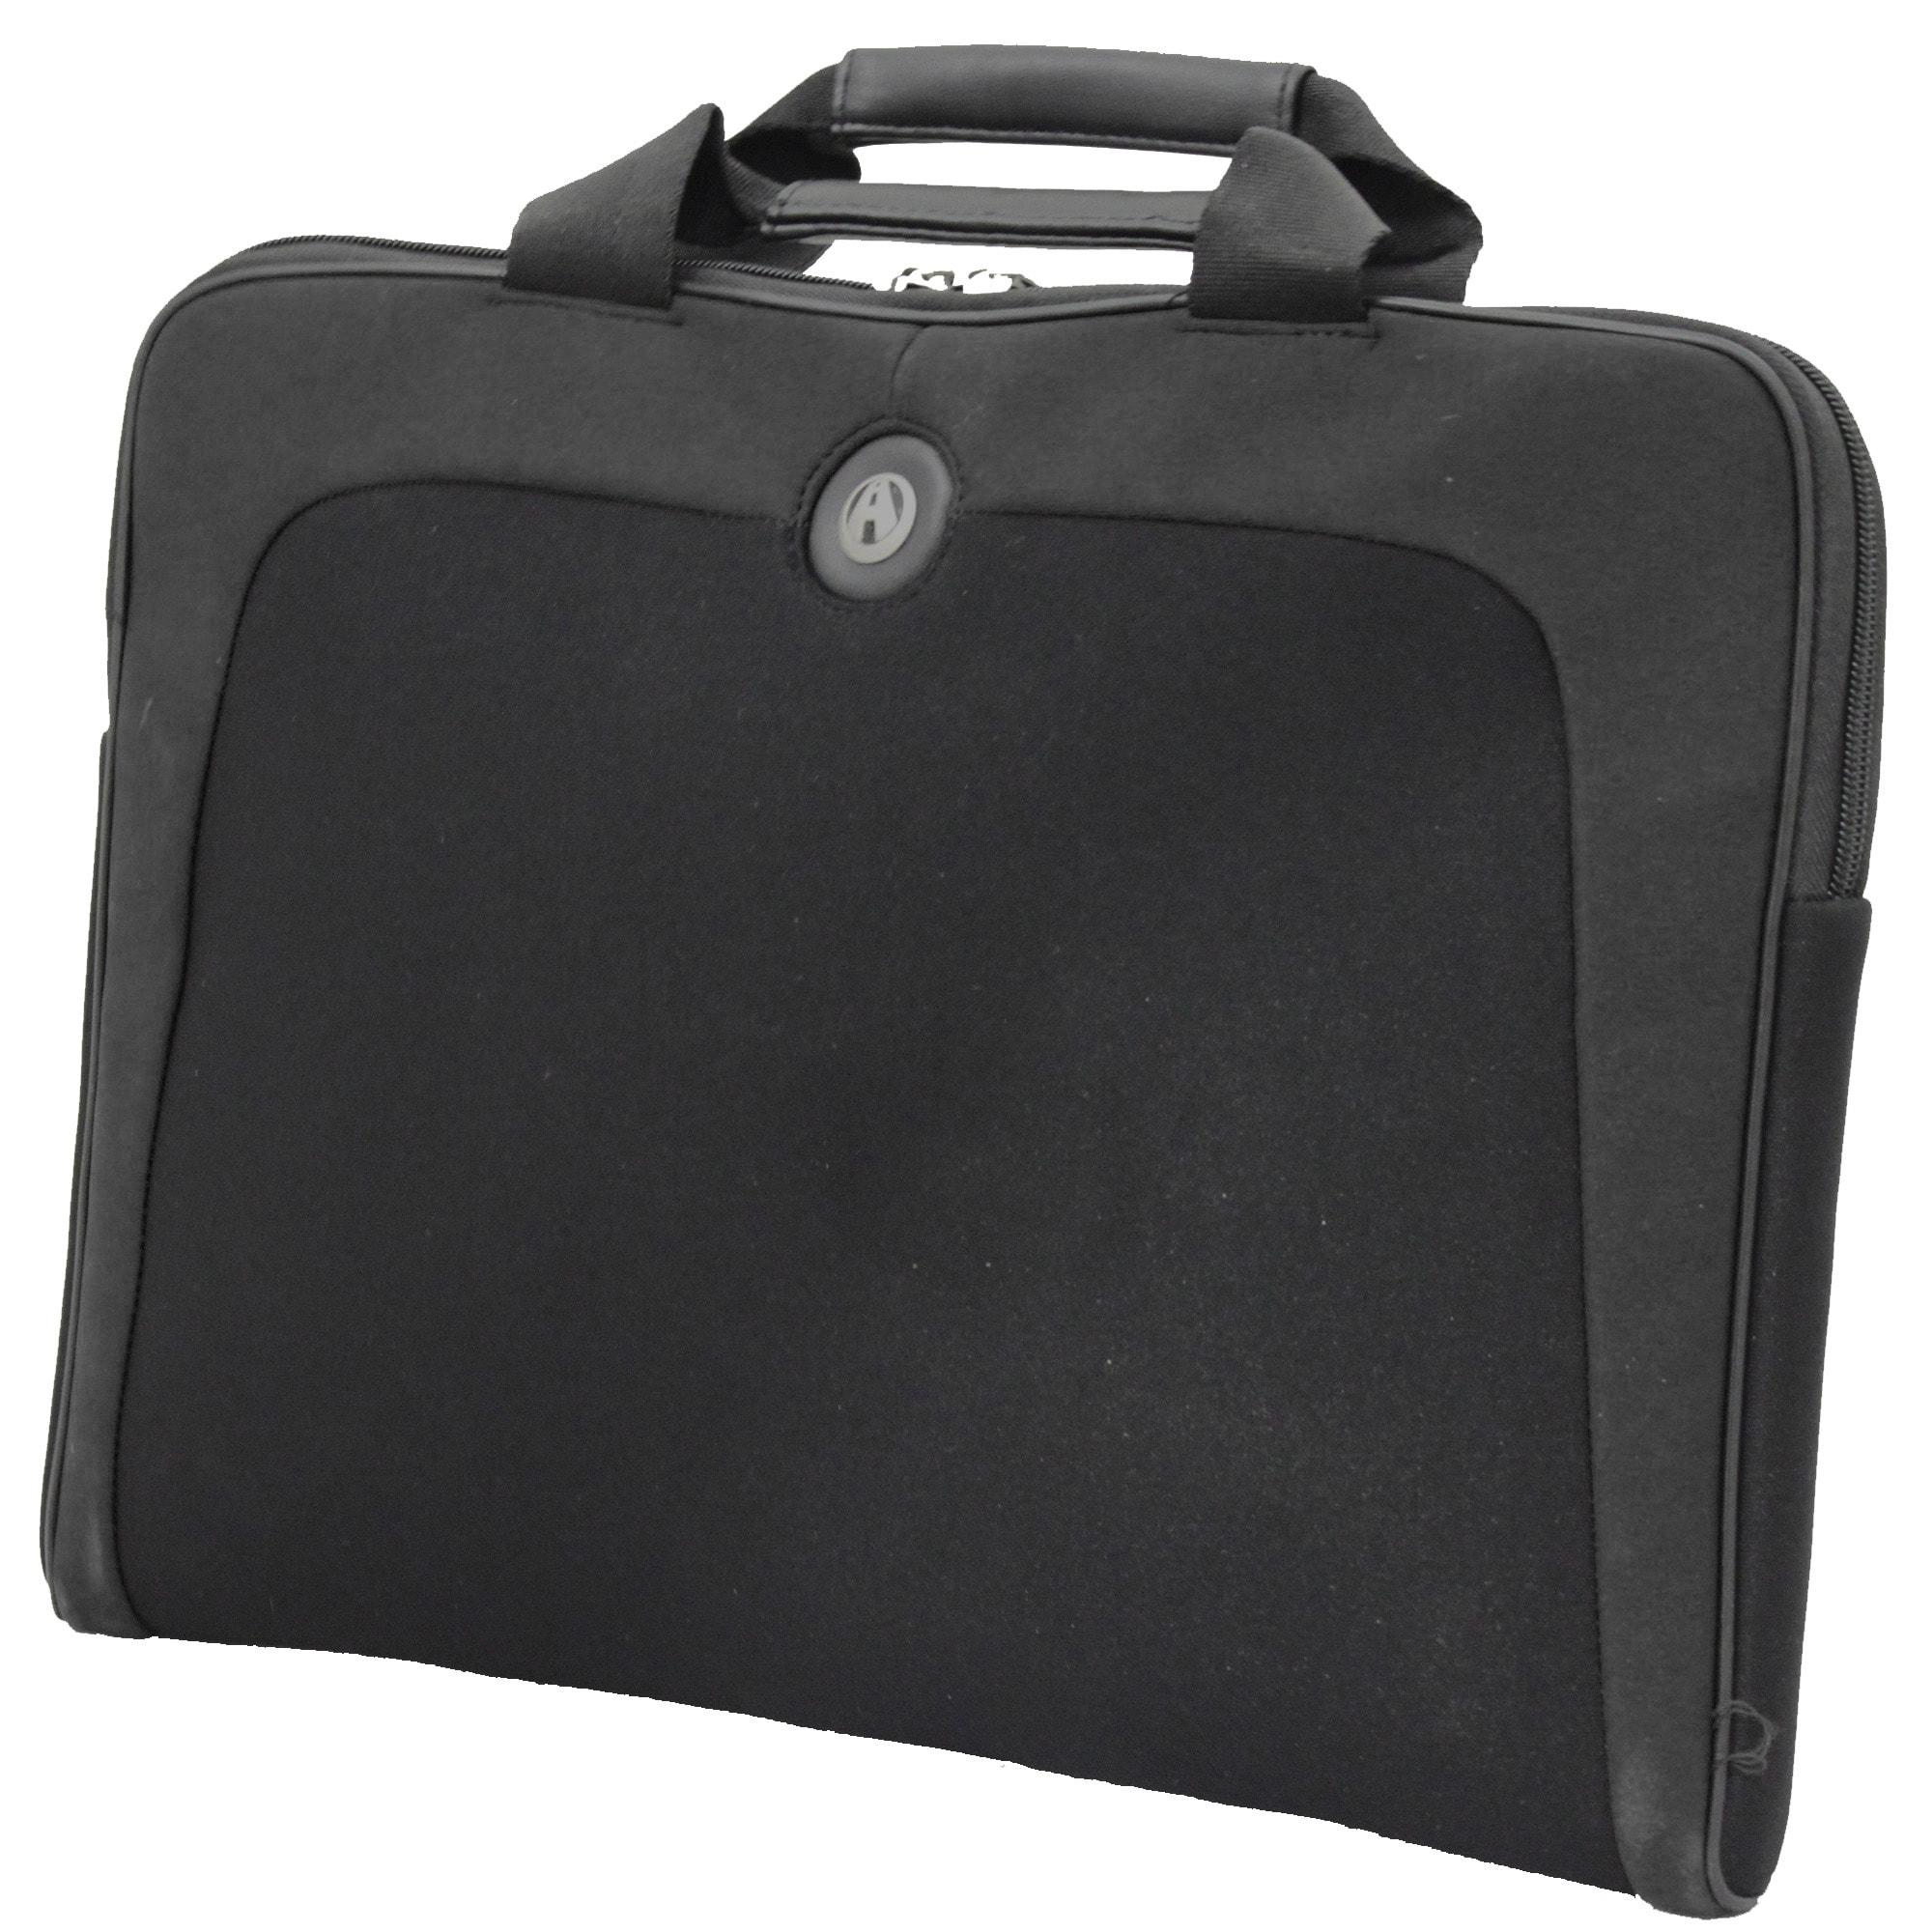 Avenues Black 'Civic' 15.4-inch Laptop Sleeve